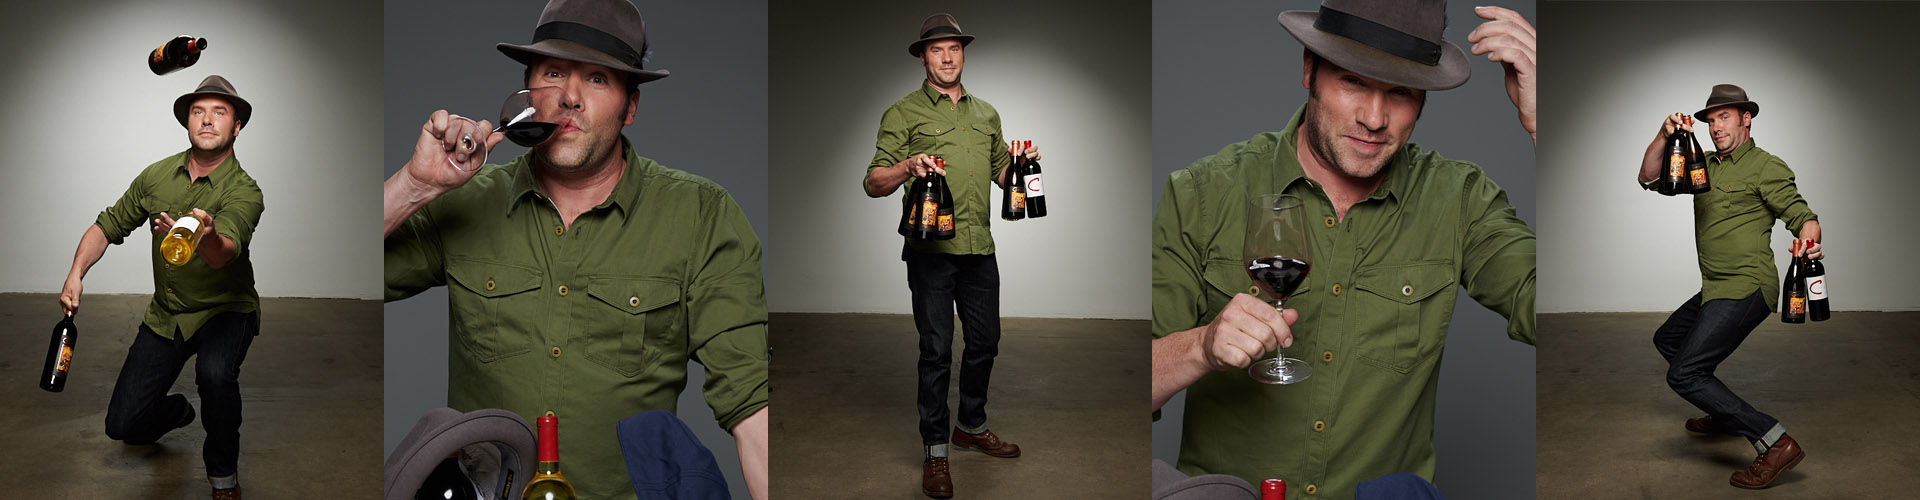 40 Under 40 Tastemaker 2018 Jonathan Hajdu, 39, Berkeley, CA Winemaker, Covenant Wines